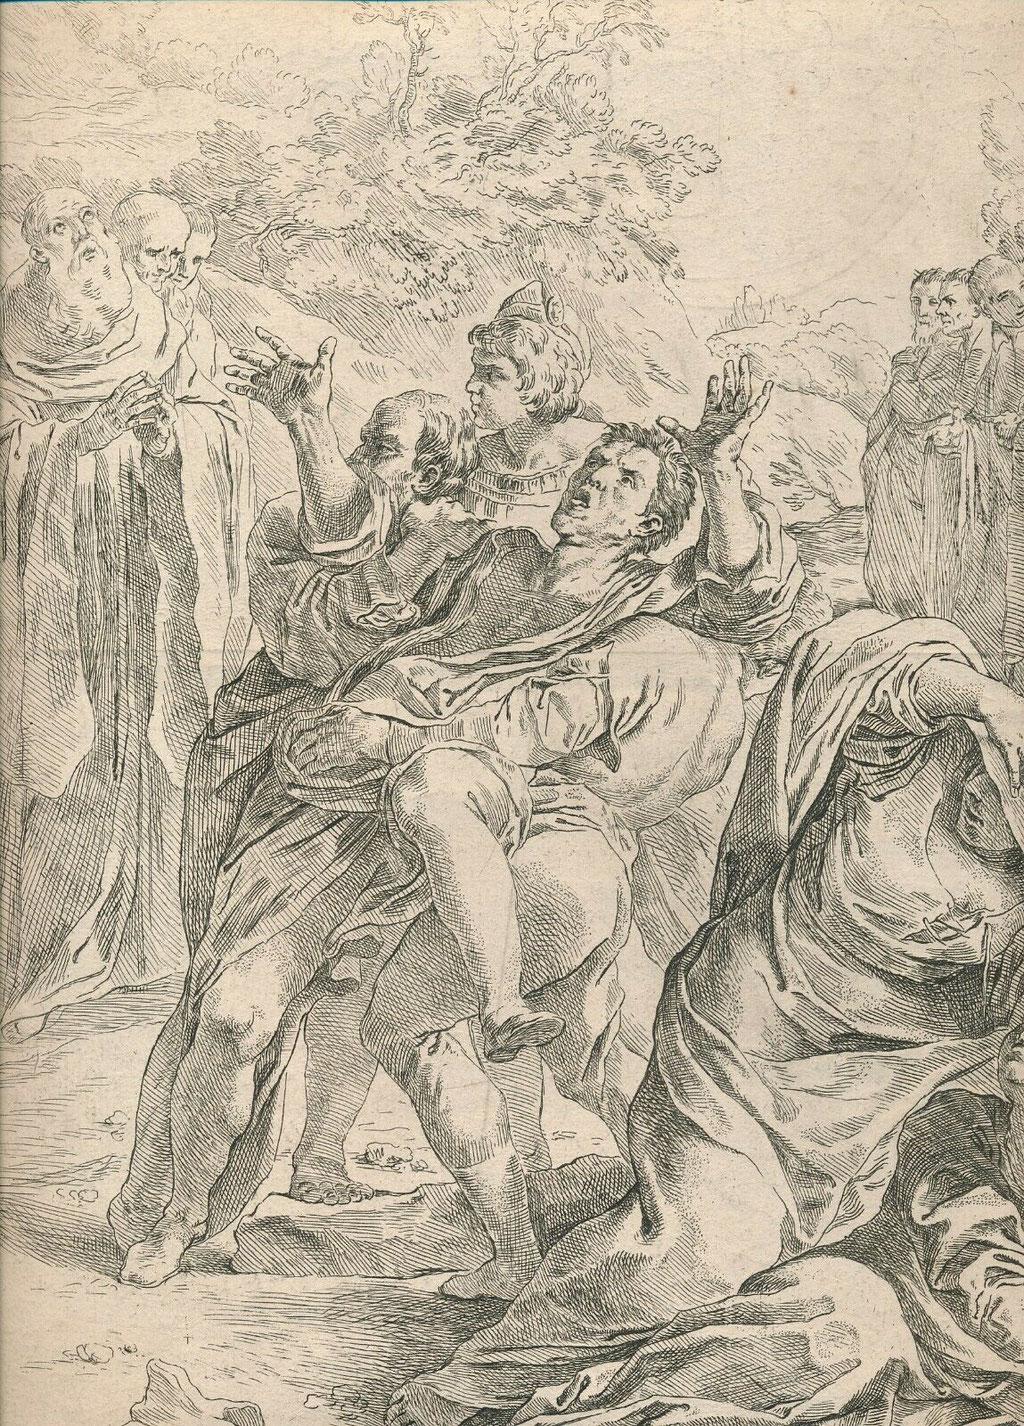 Simone Cantarini, gravure